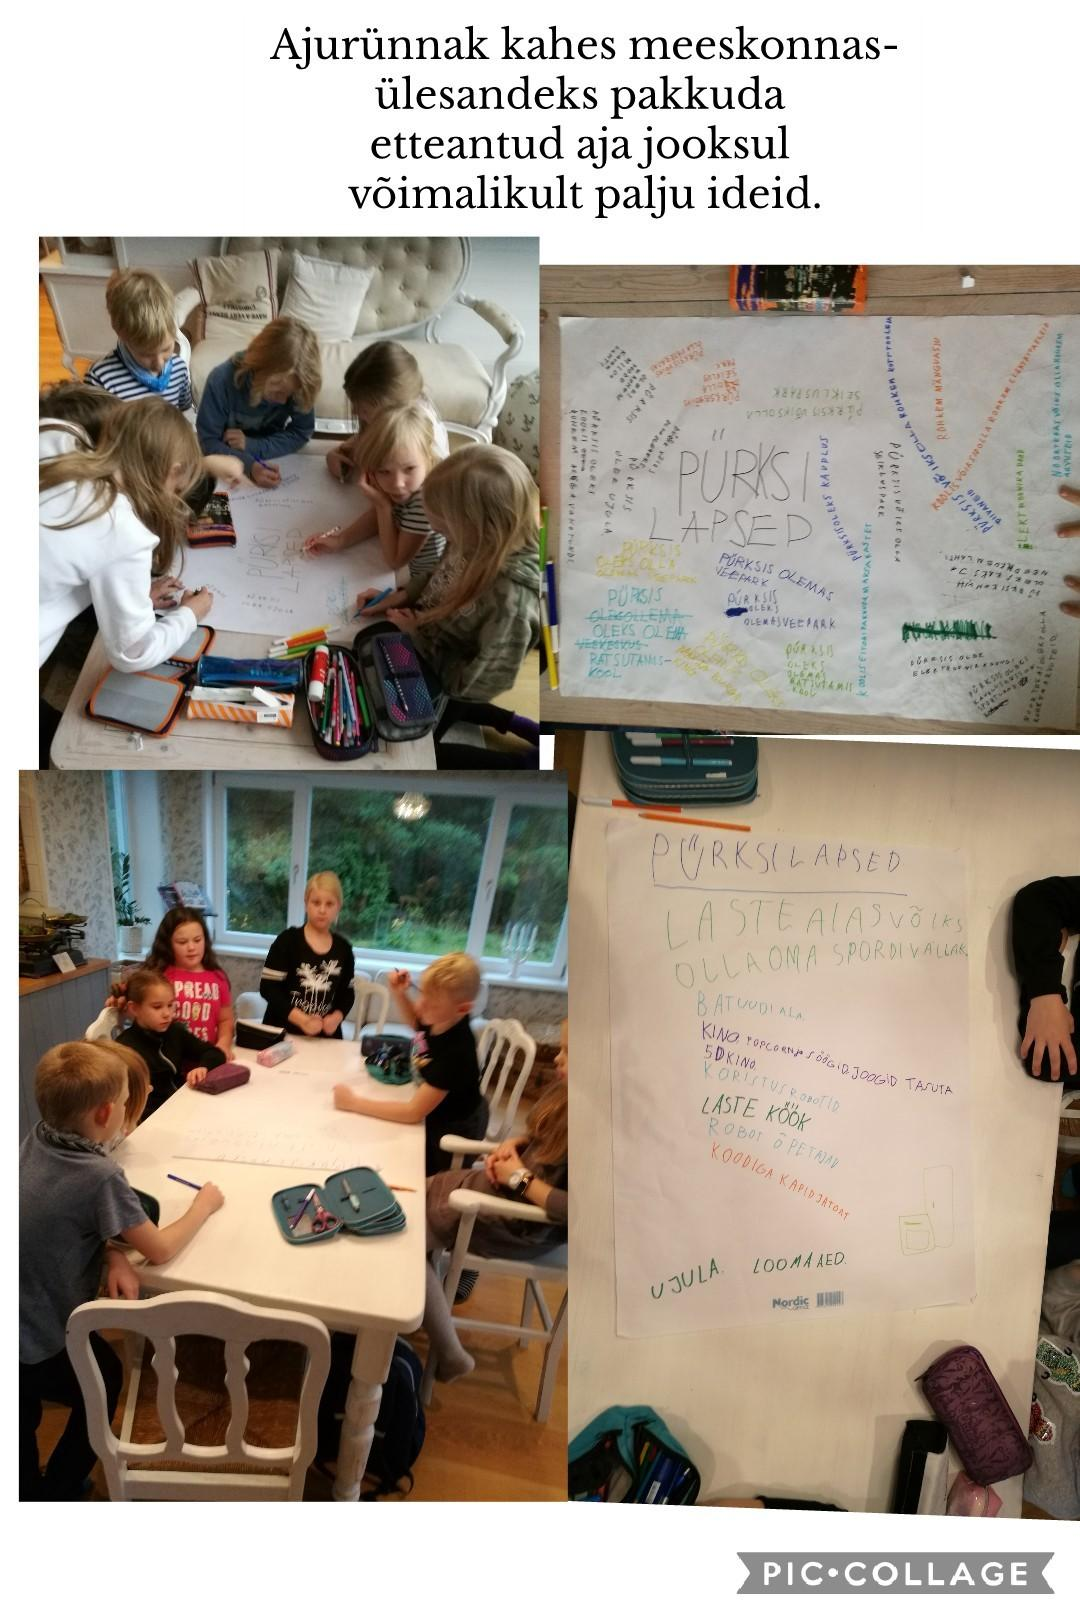 2.-3. klass - Pürksi küla tuleviku loojad